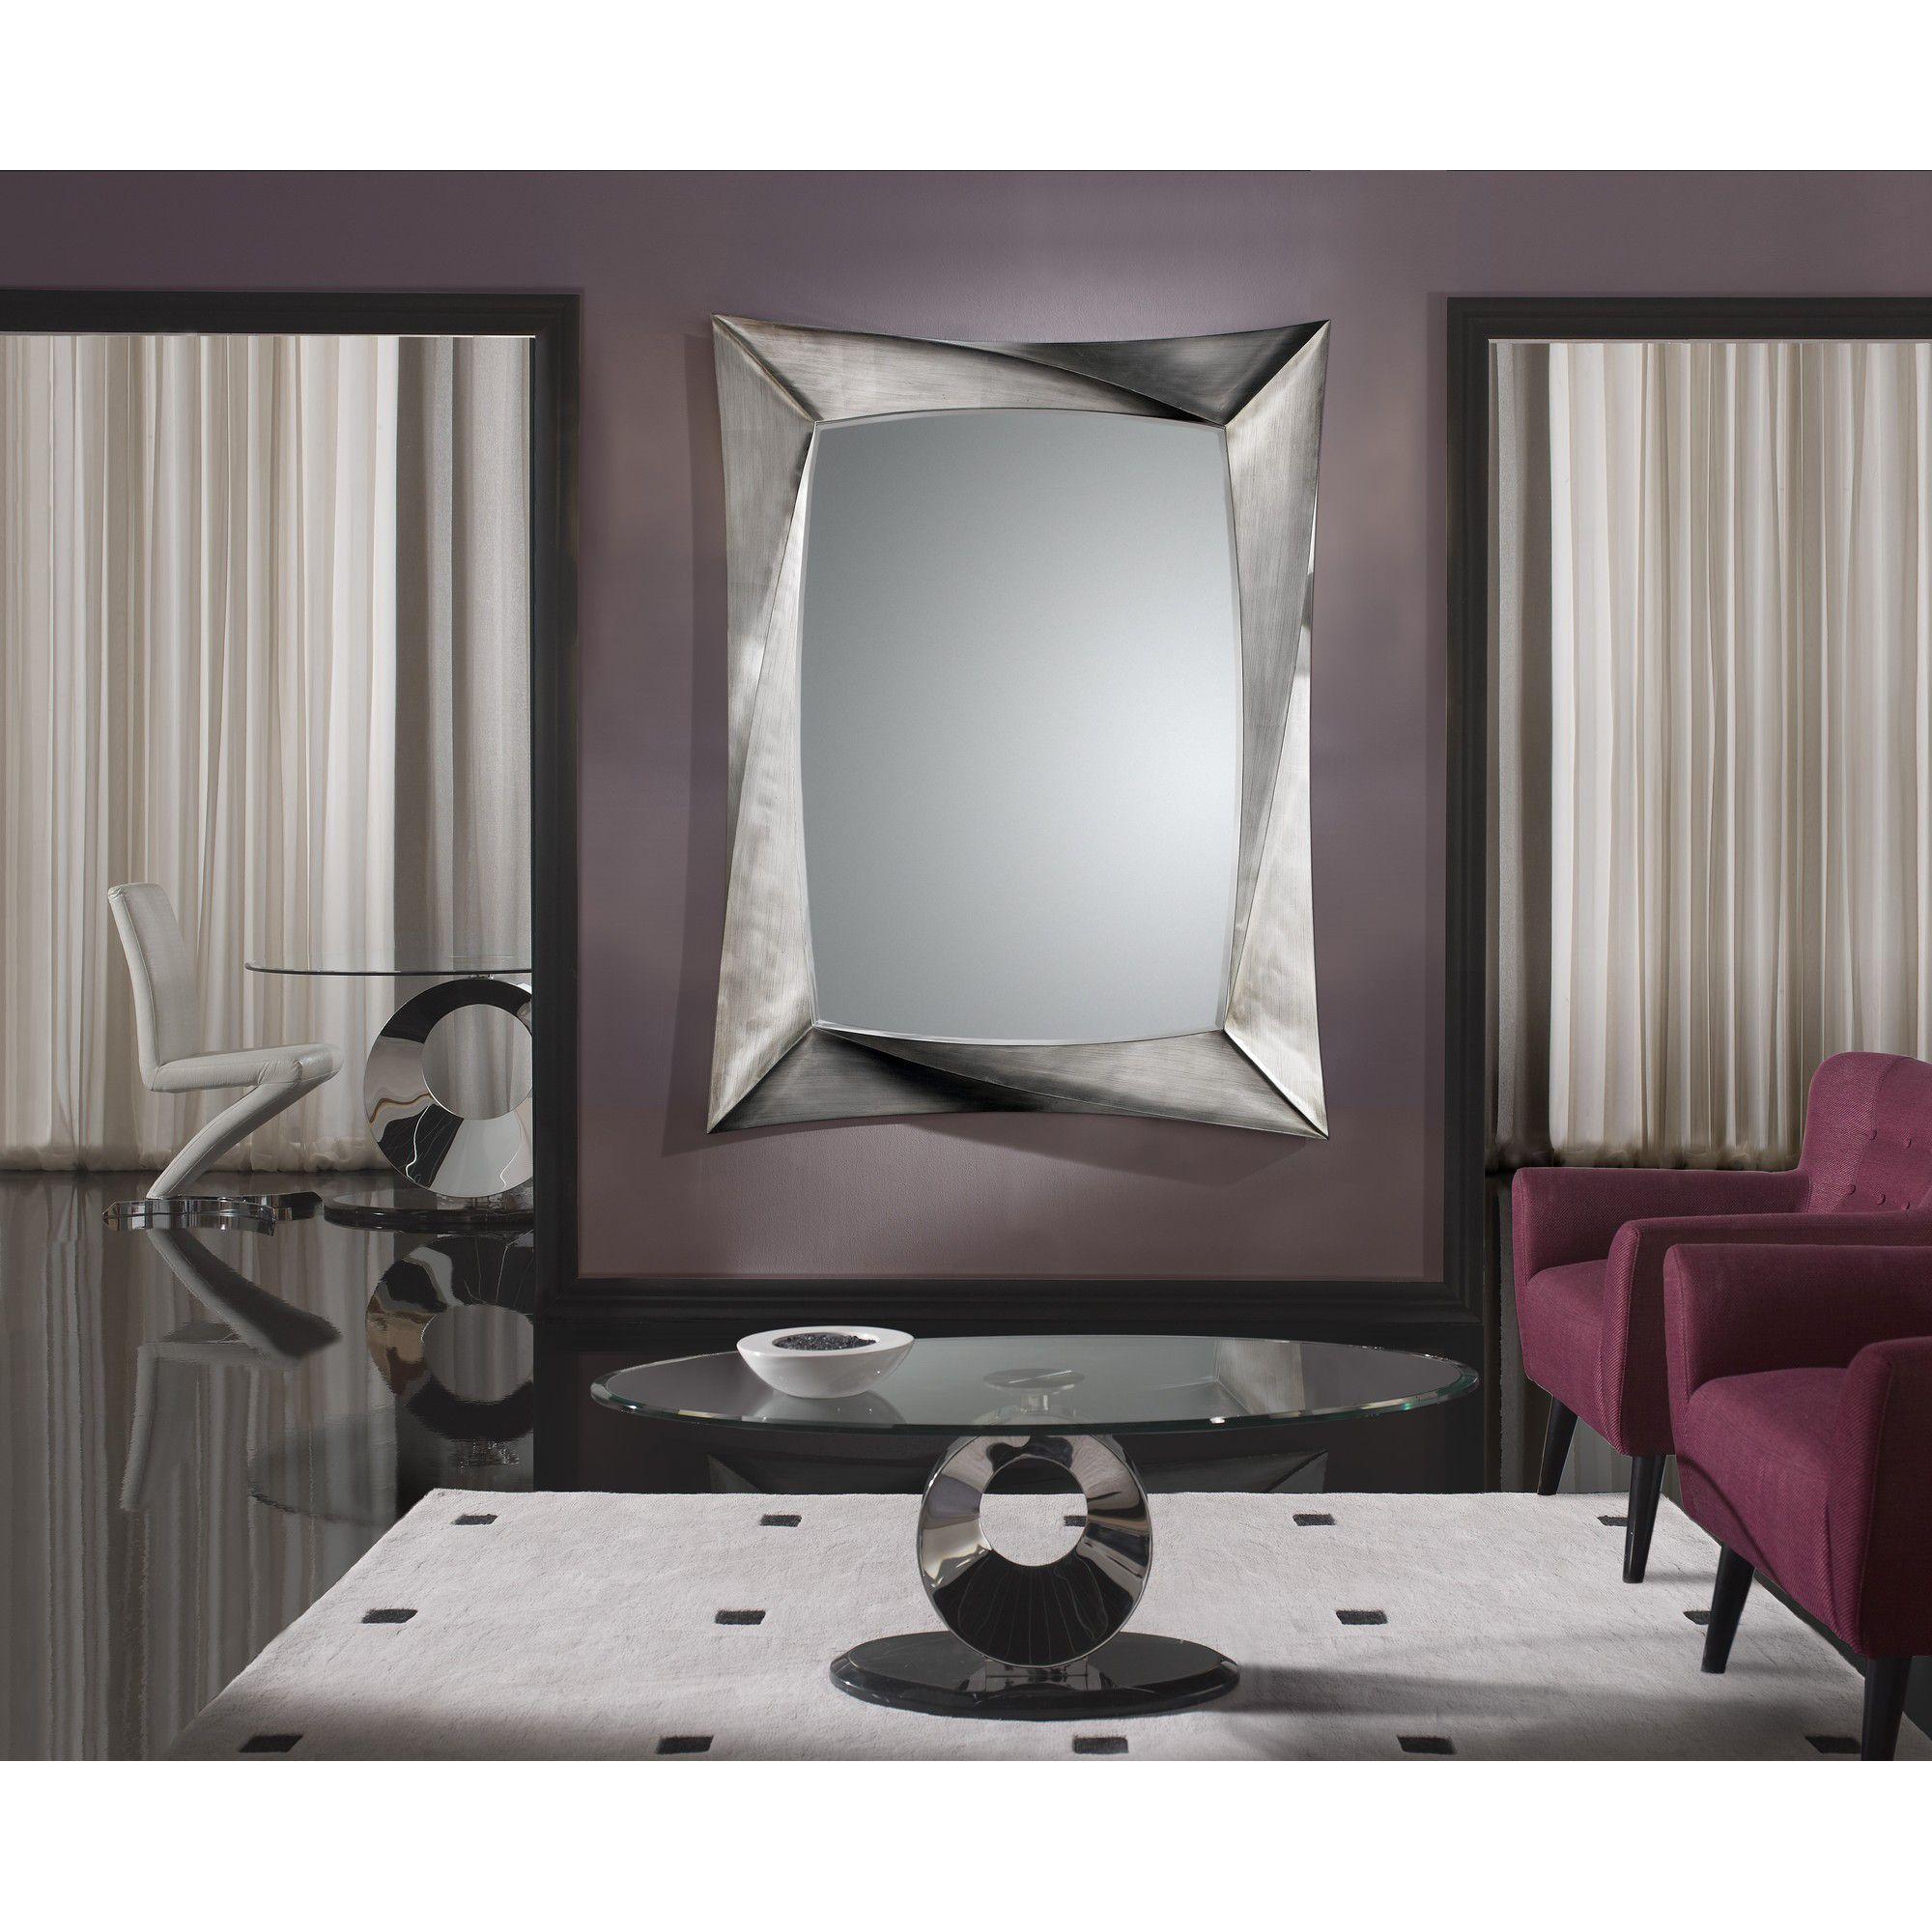 schuller-deco-mirror